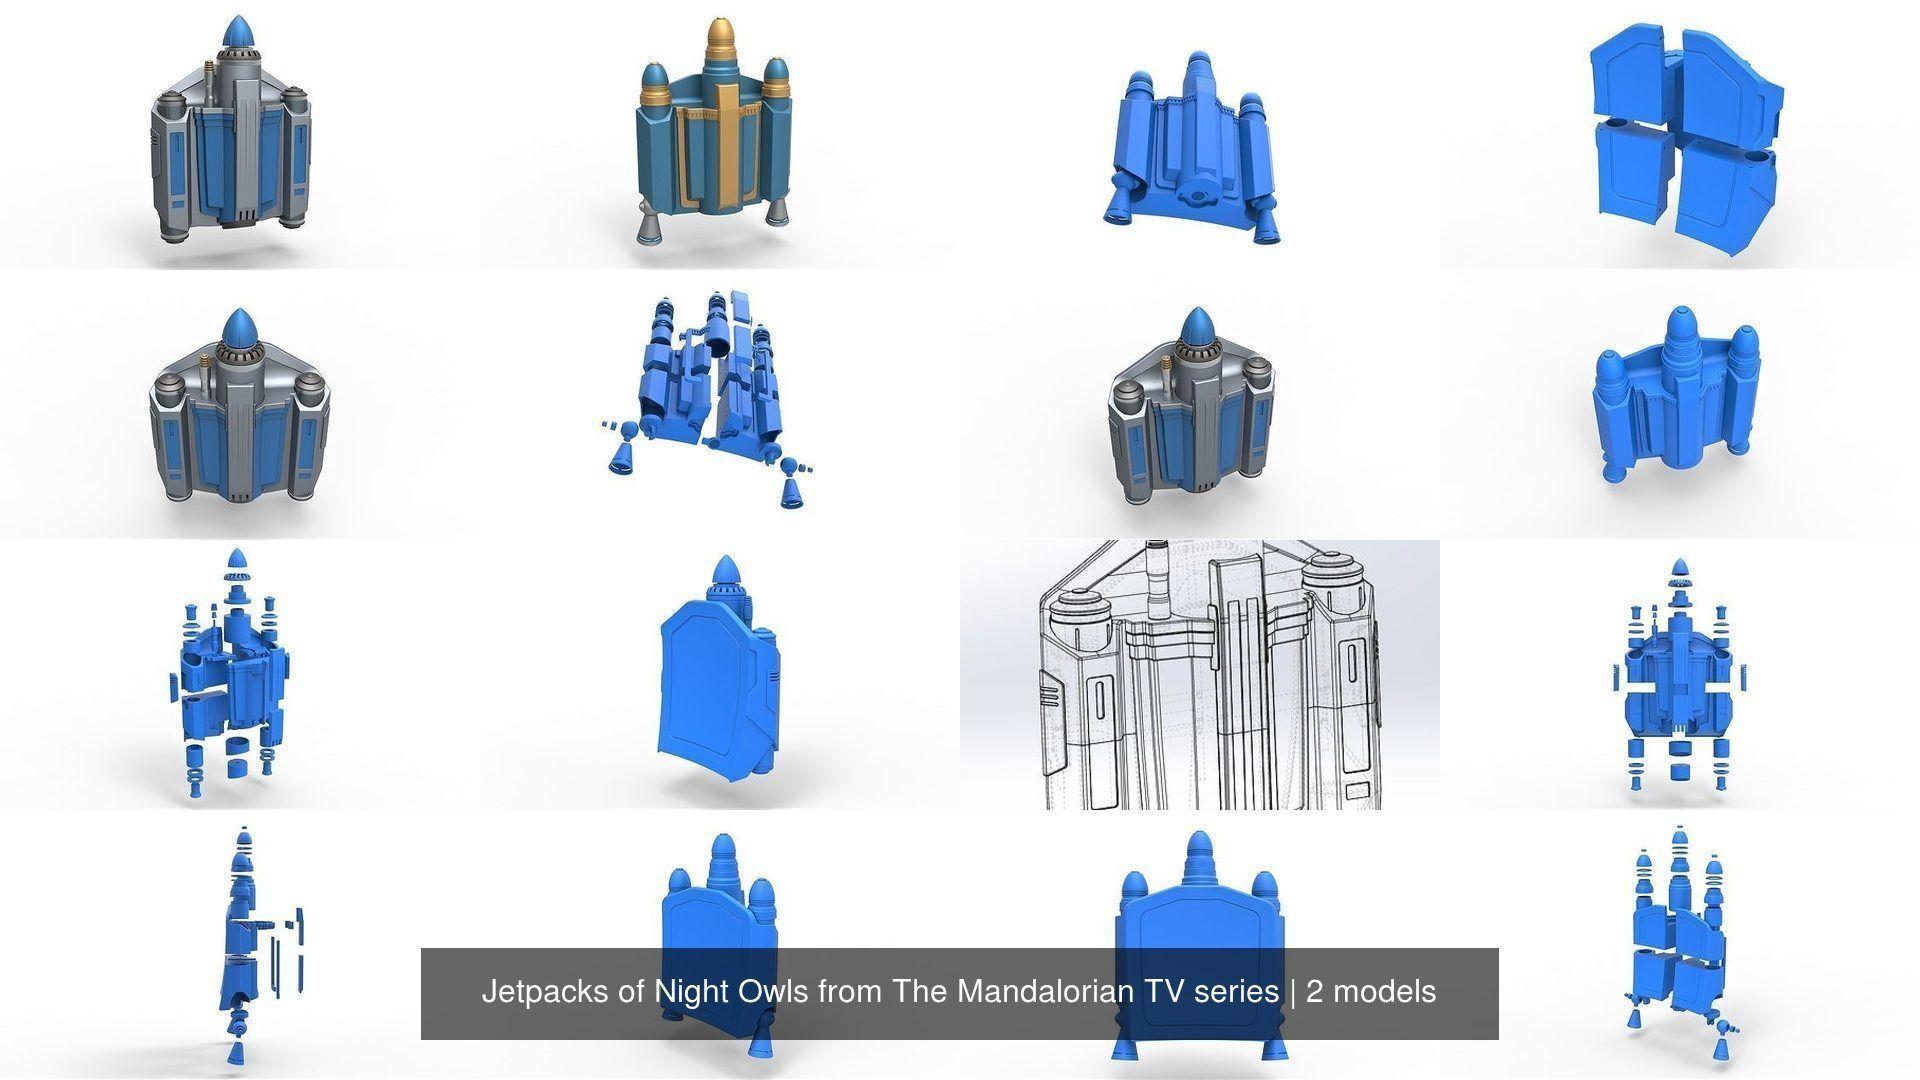 Jetpacks of Night Owls from The Mandalorian TV series